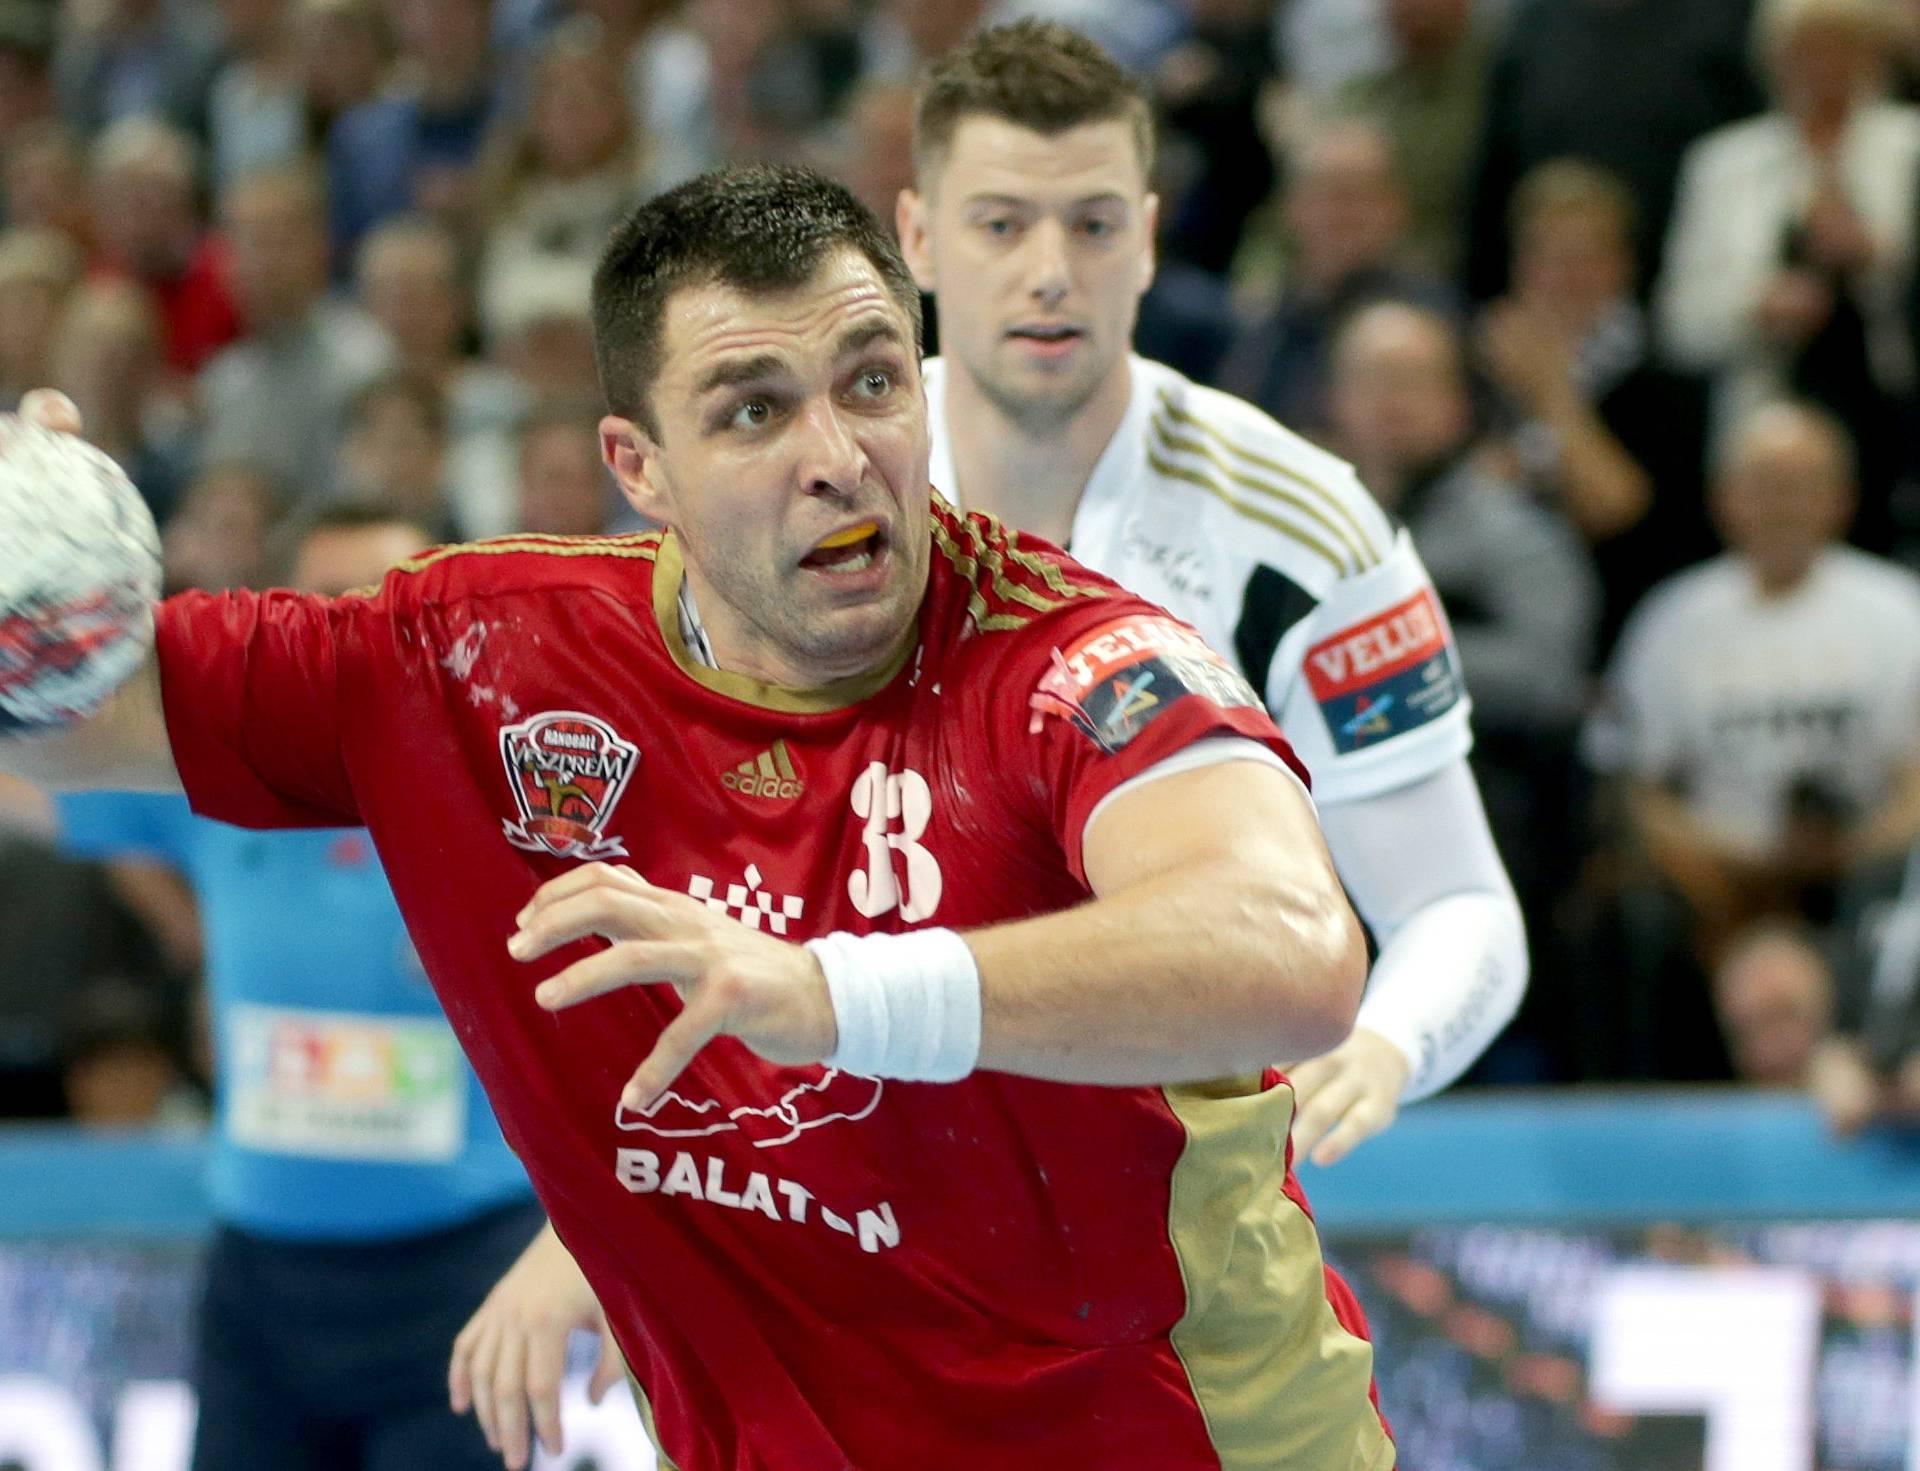 Handball: THW Kiel vs MKB Veszprem